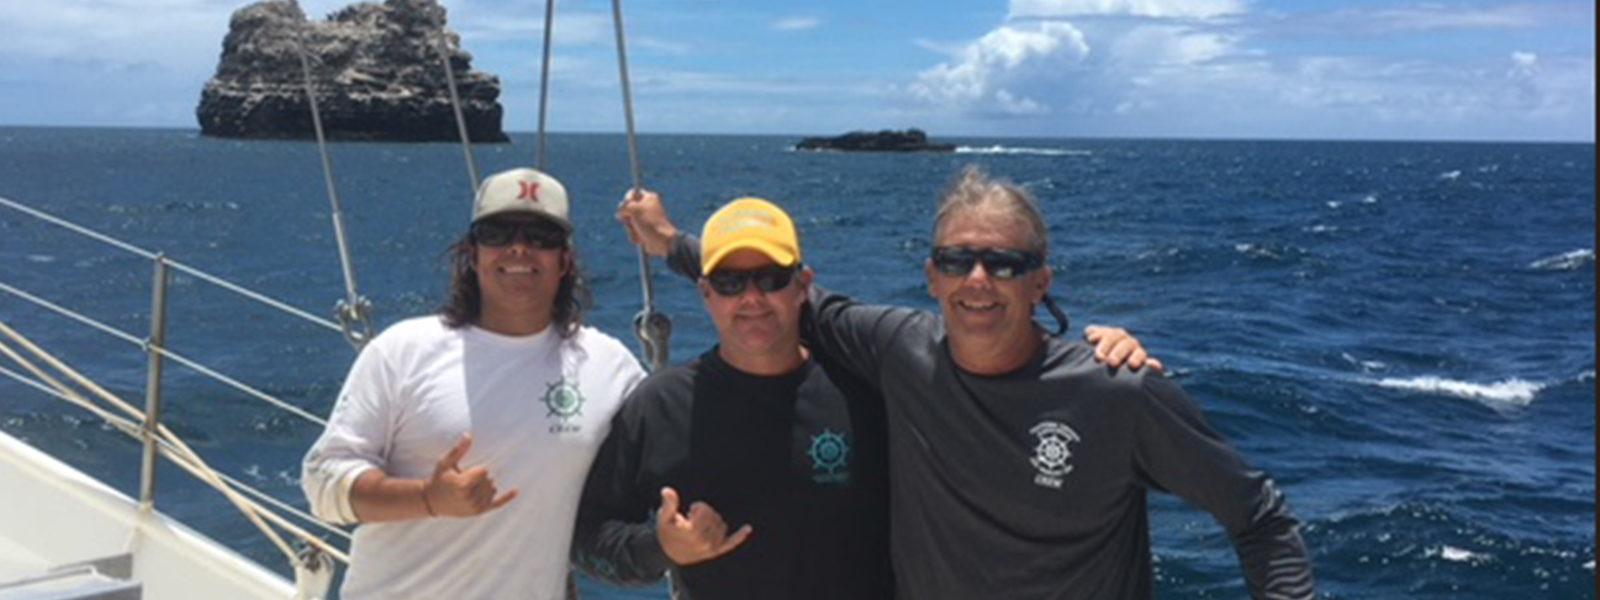 Northland College alumnus Matt Claybaugh directs Merimed in Hawaii